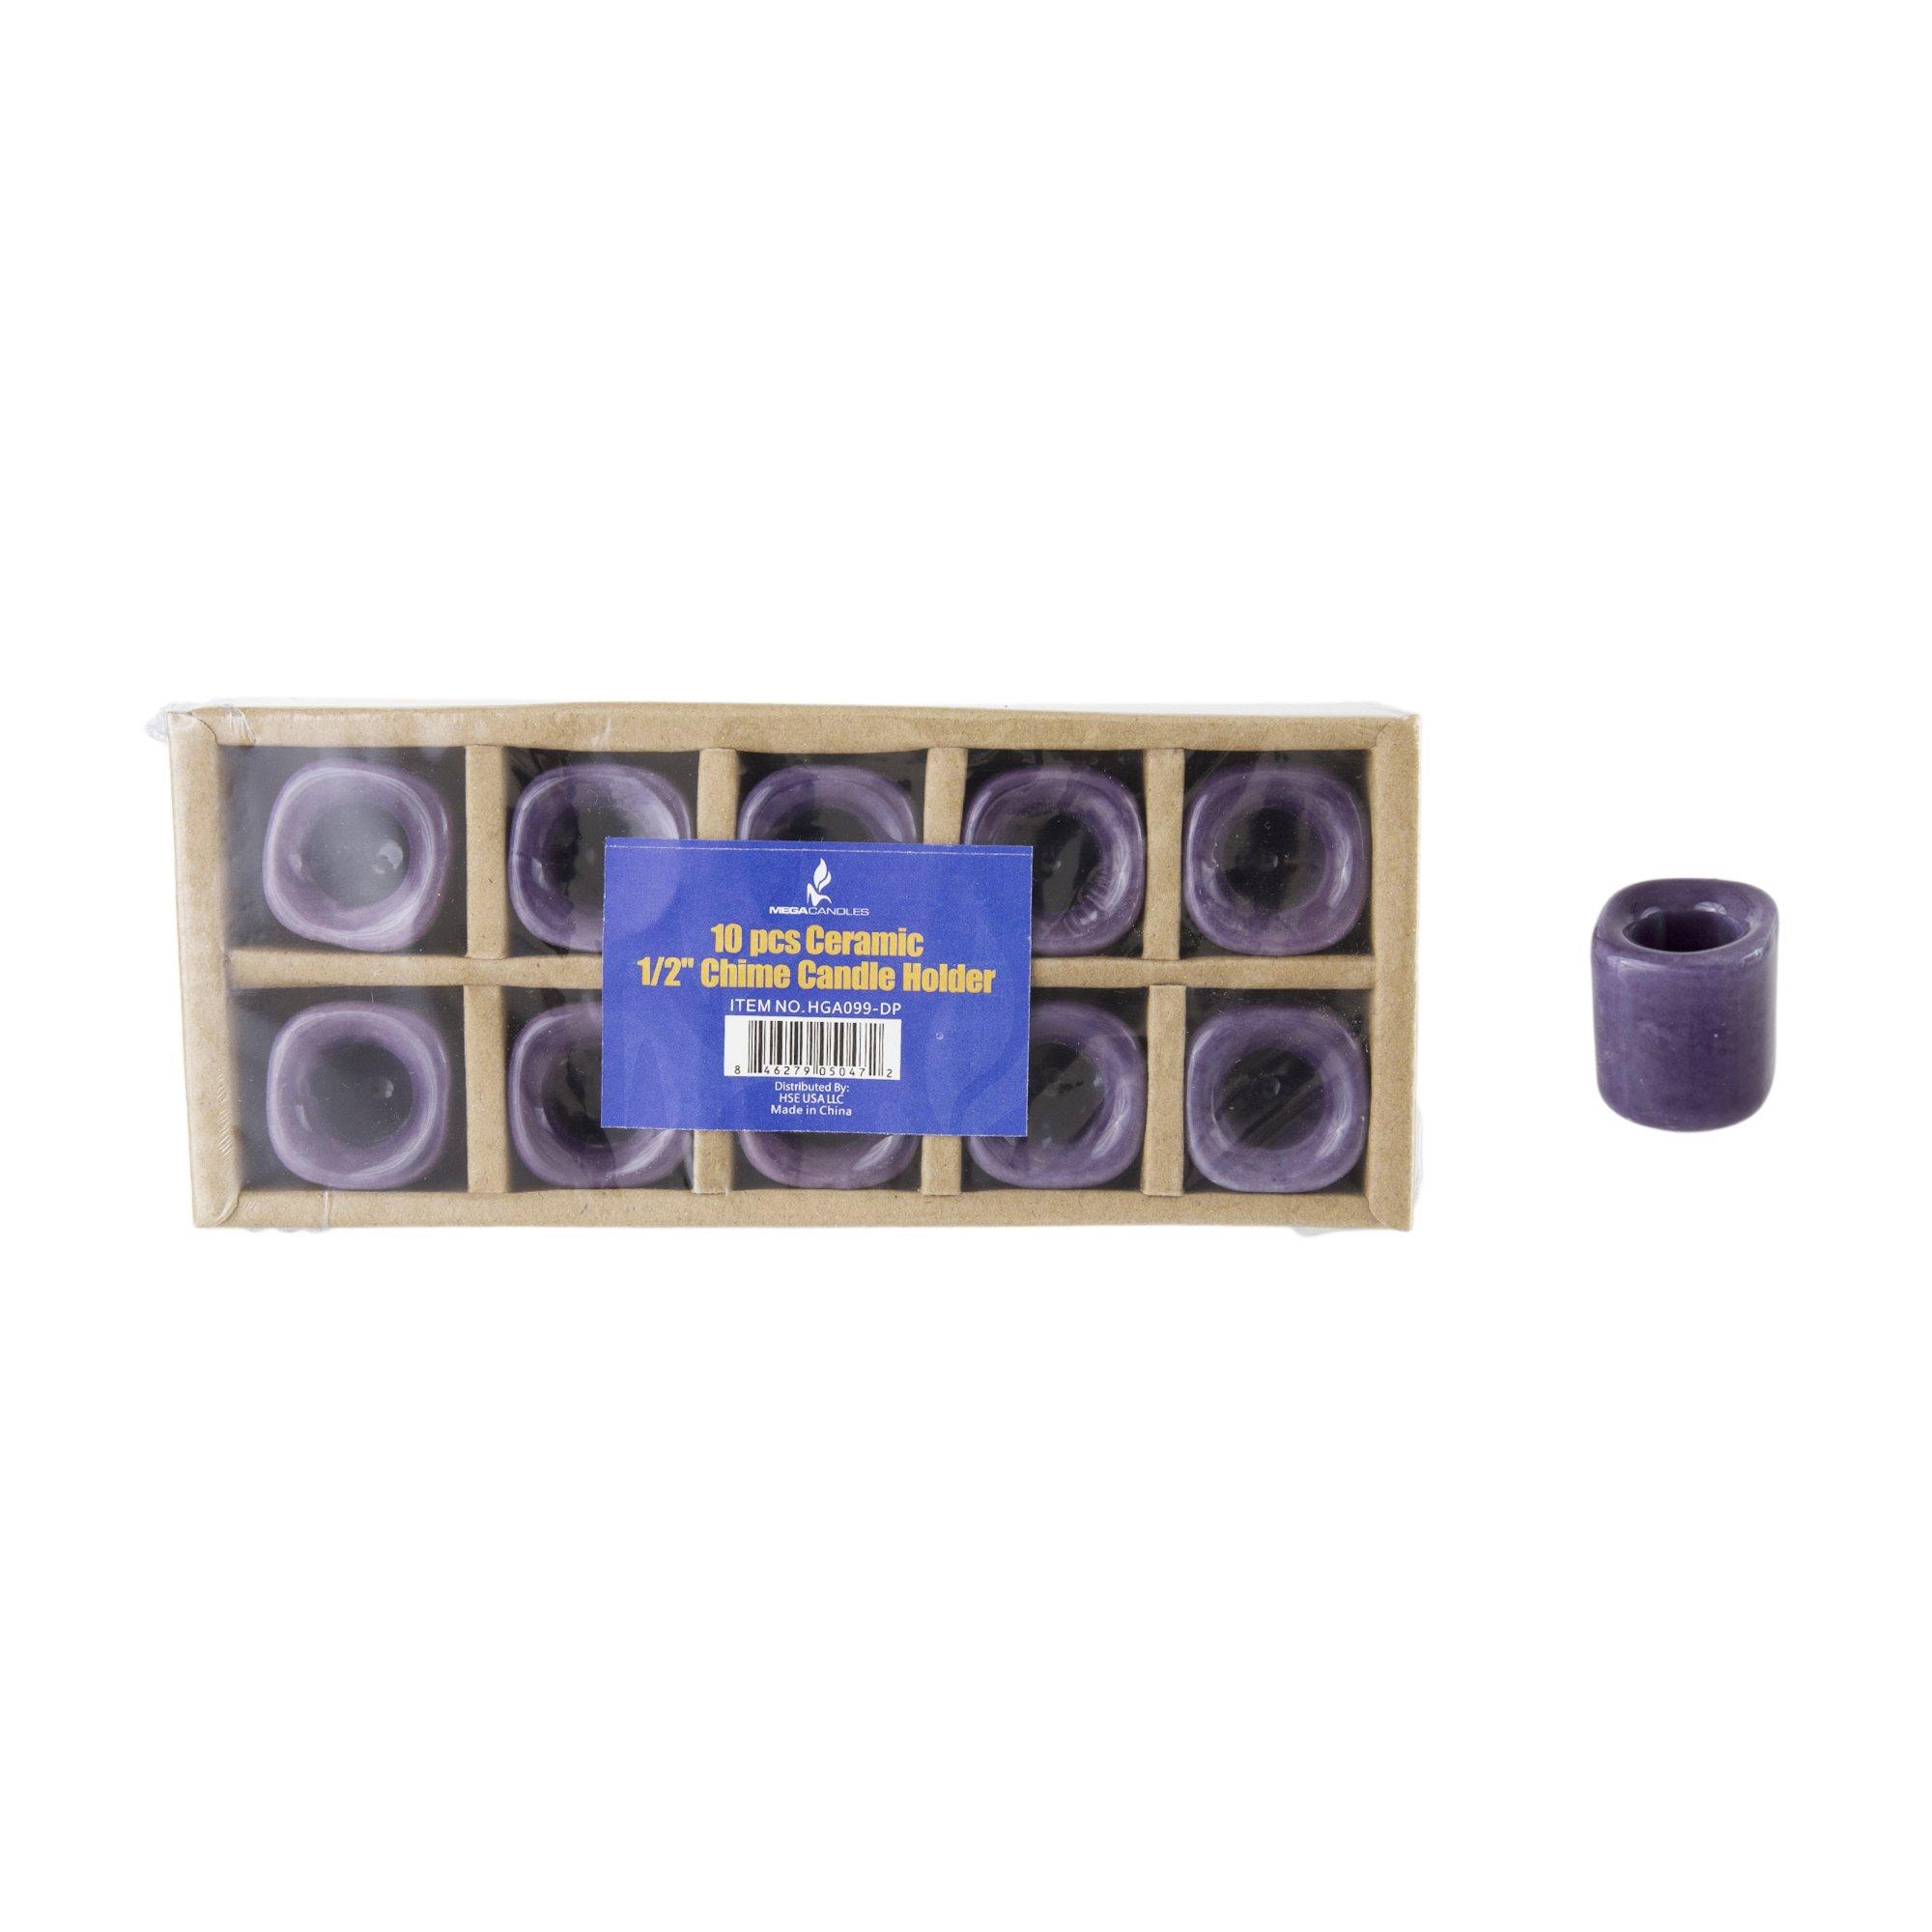 Mega Candles - 10 pcs Ceramic Chime Ritual Spell Candle Holders - Dark Purple